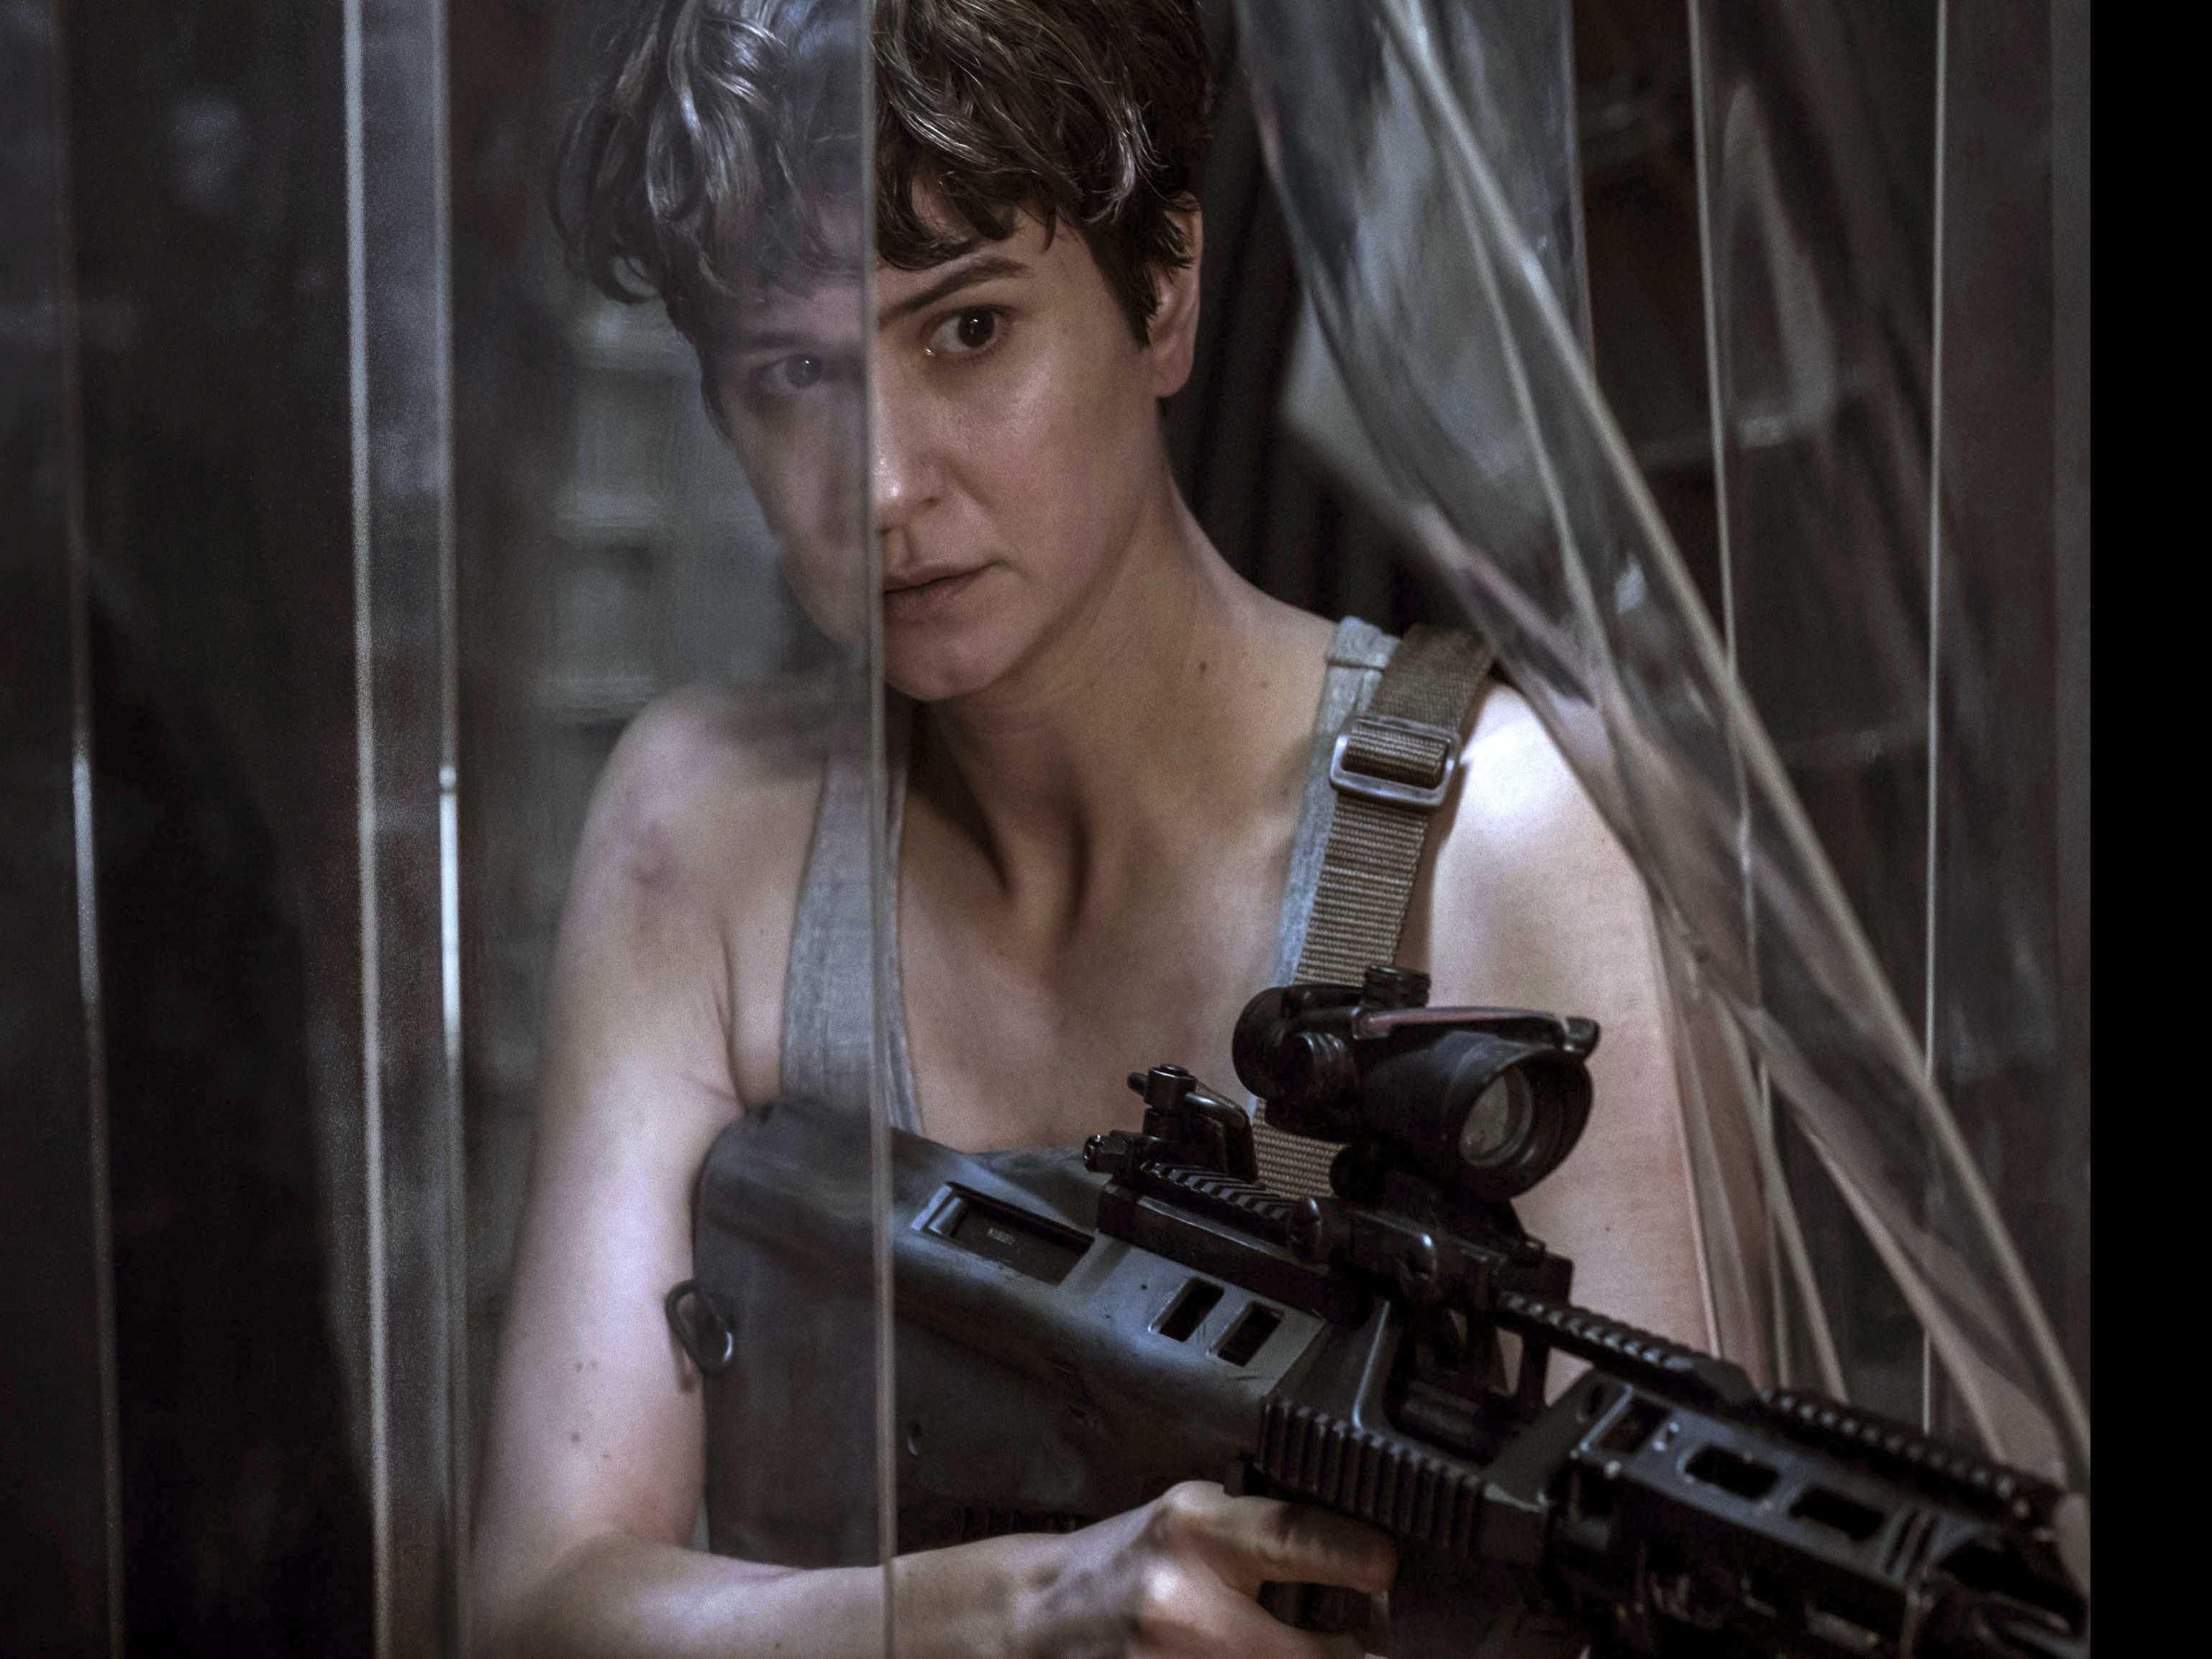 'Alien: Covenant' Edges 'Guardians' at Weekend Box Office